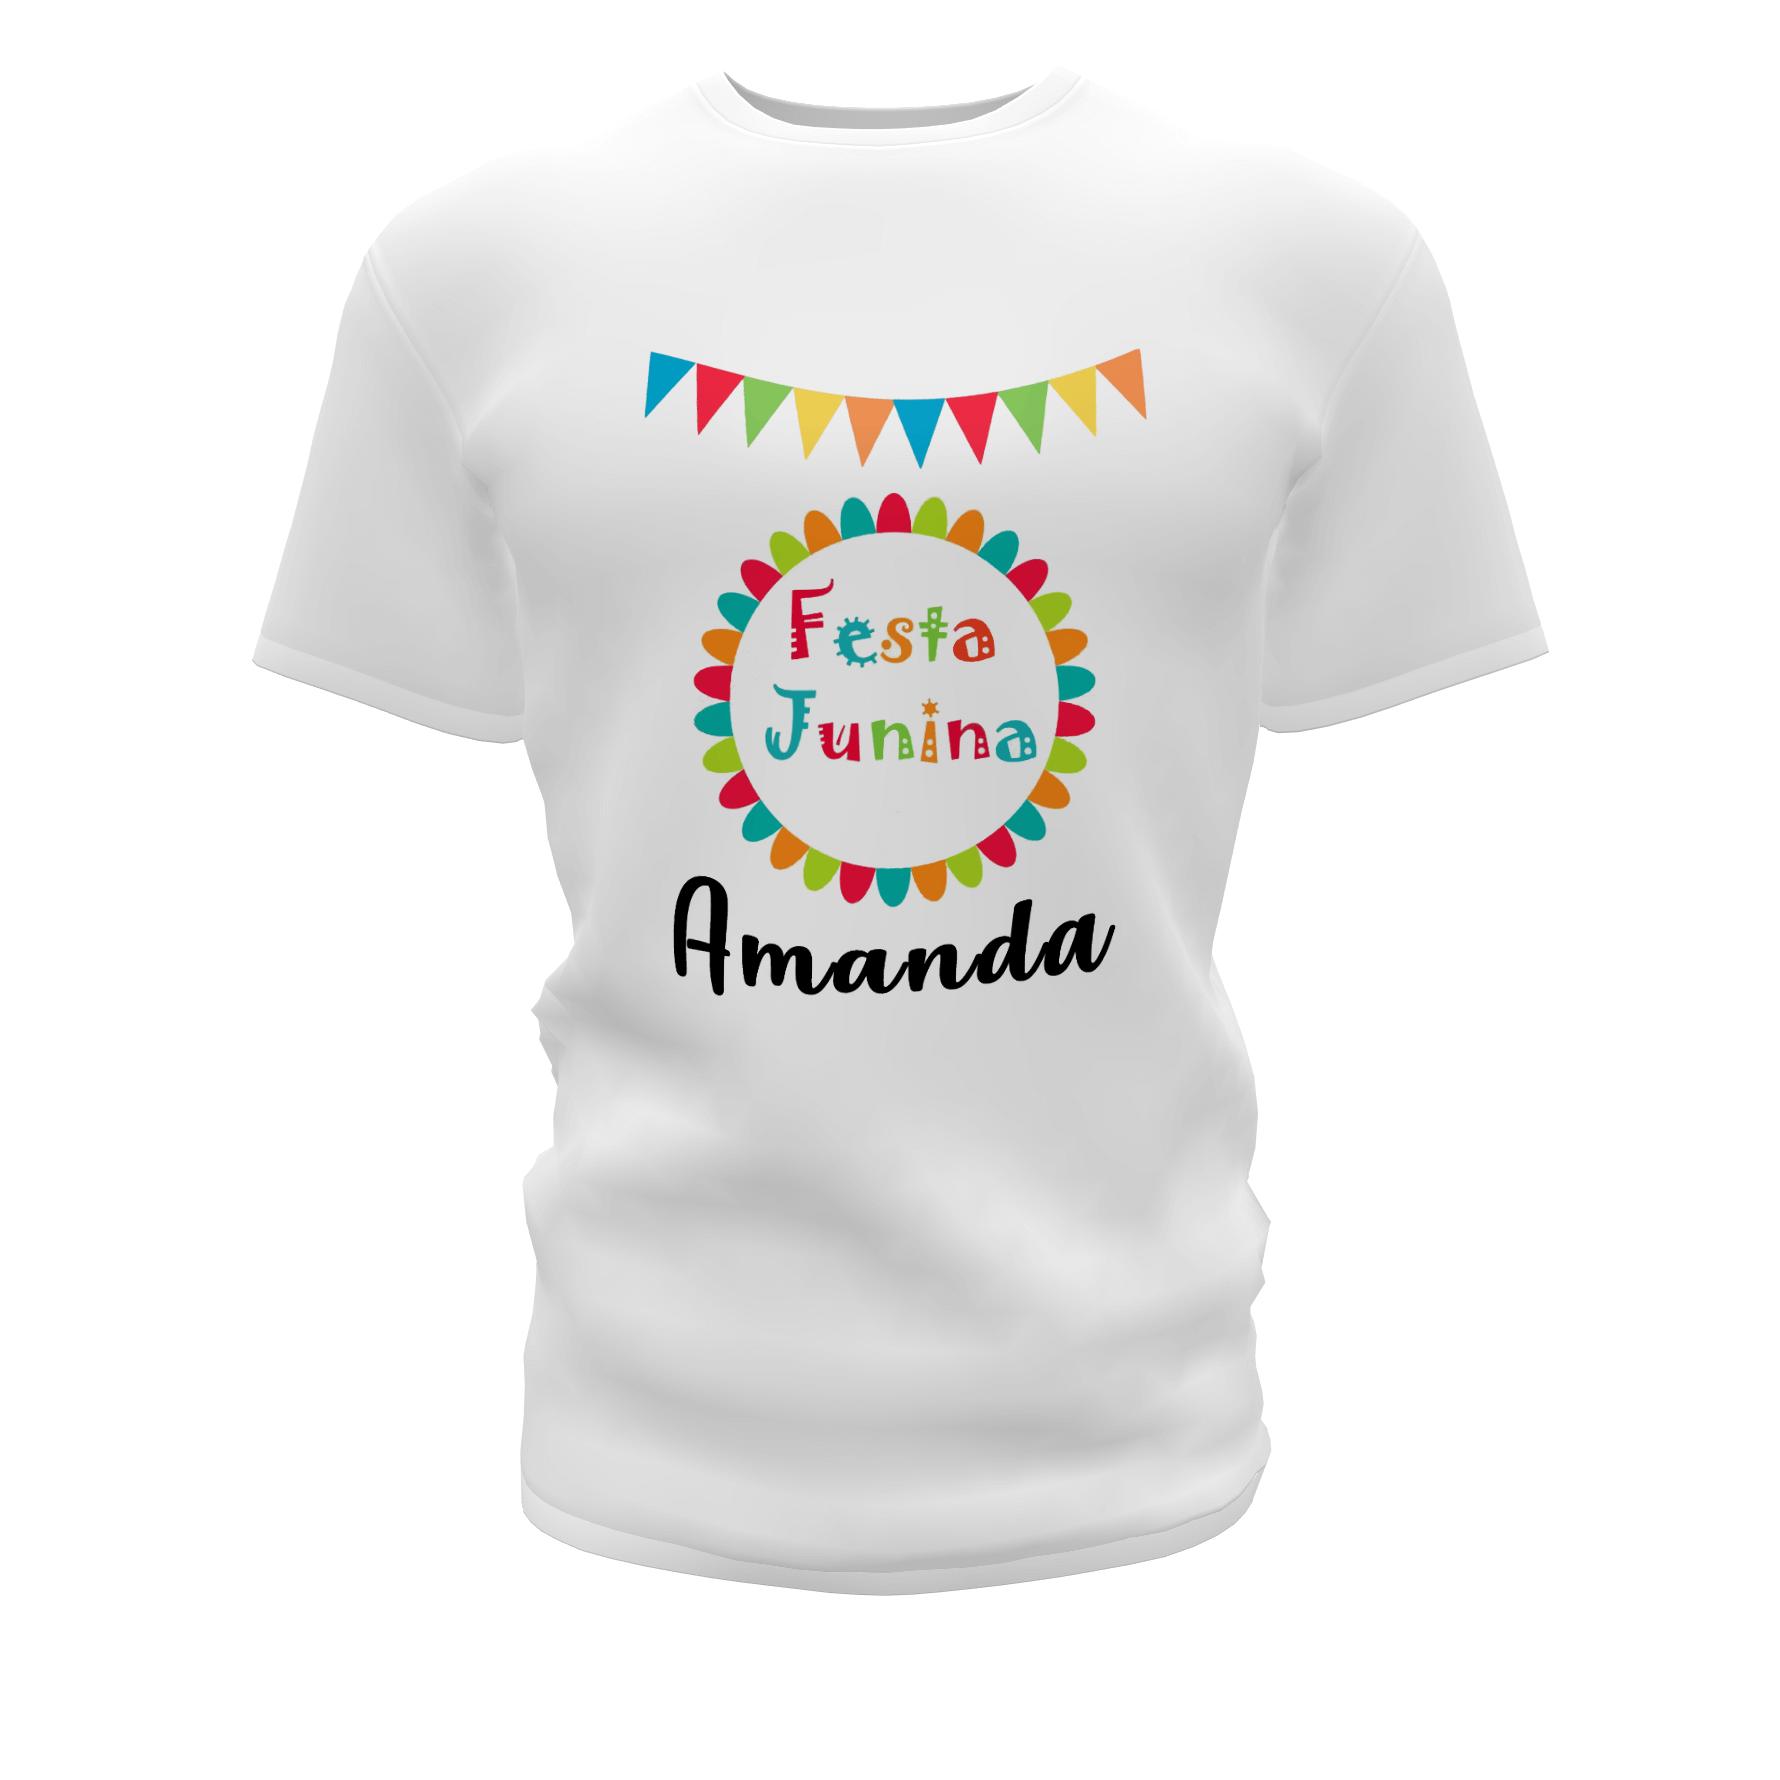 Camisetas Personalizadas para Festa Junina